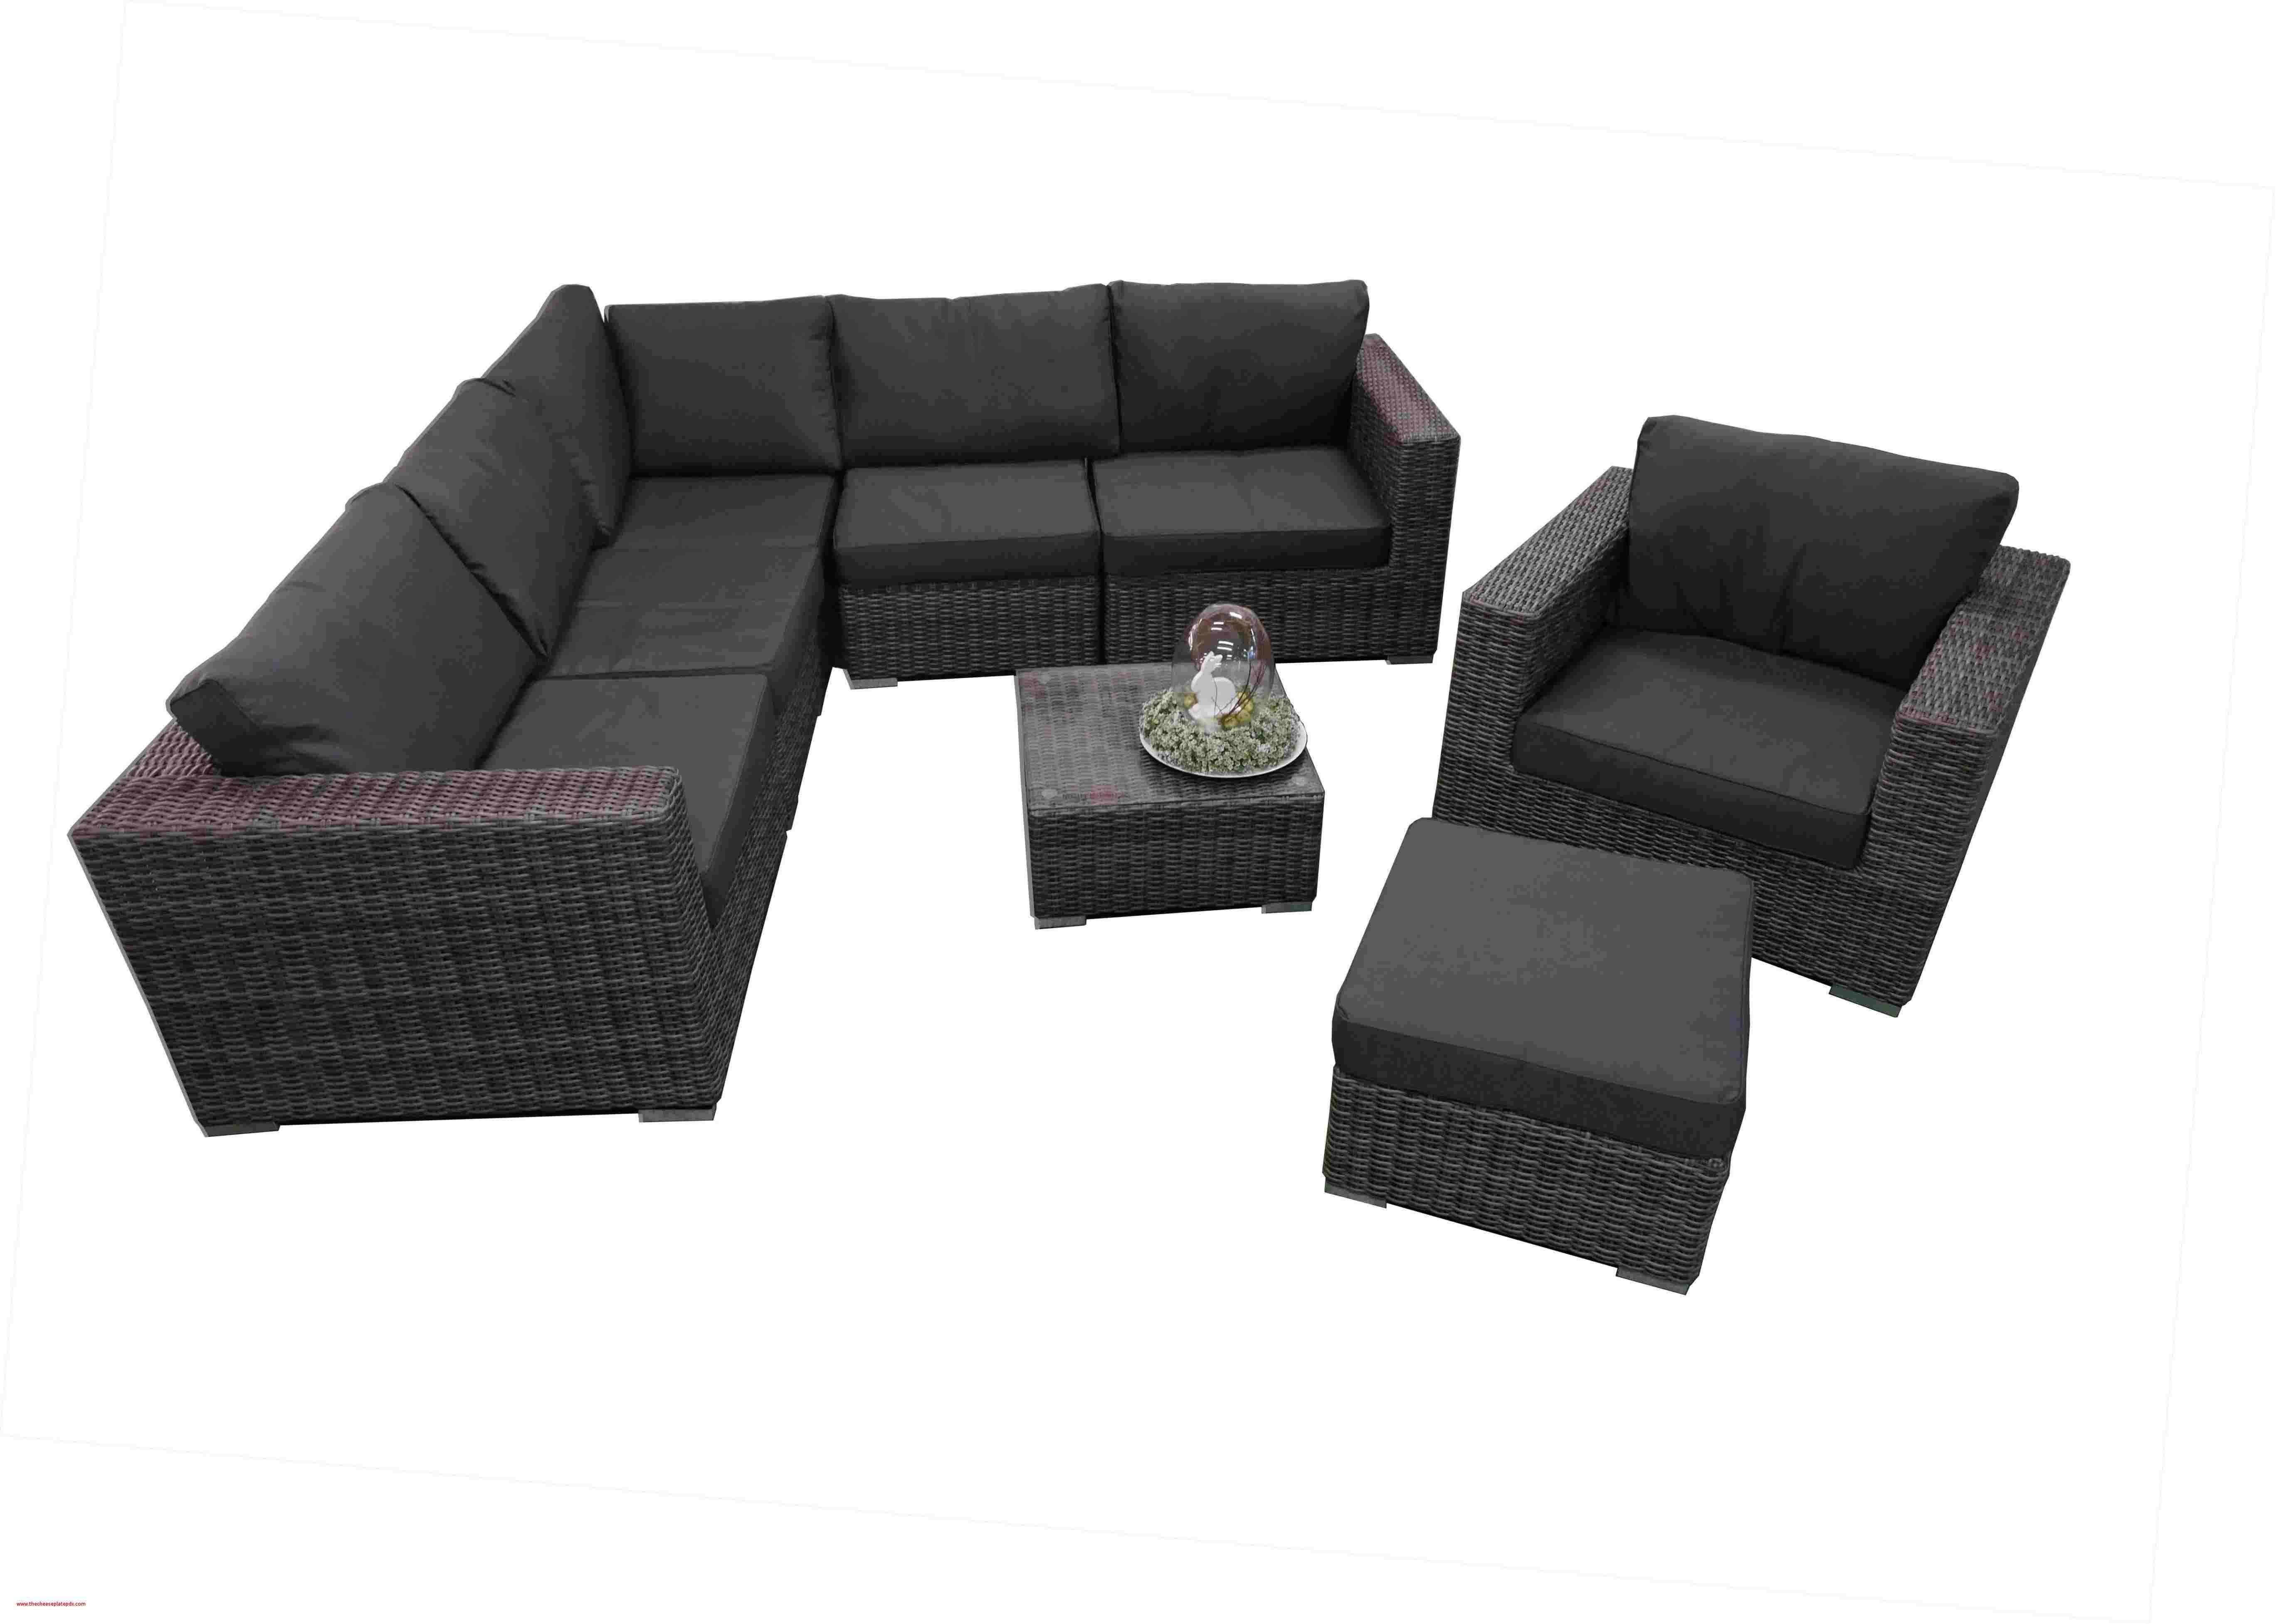 Pin By Putrantosinta On Big Sofa Mit Schlaffunktion Outdoor Furniture Sets White Farmhouse Outdoor Furniture